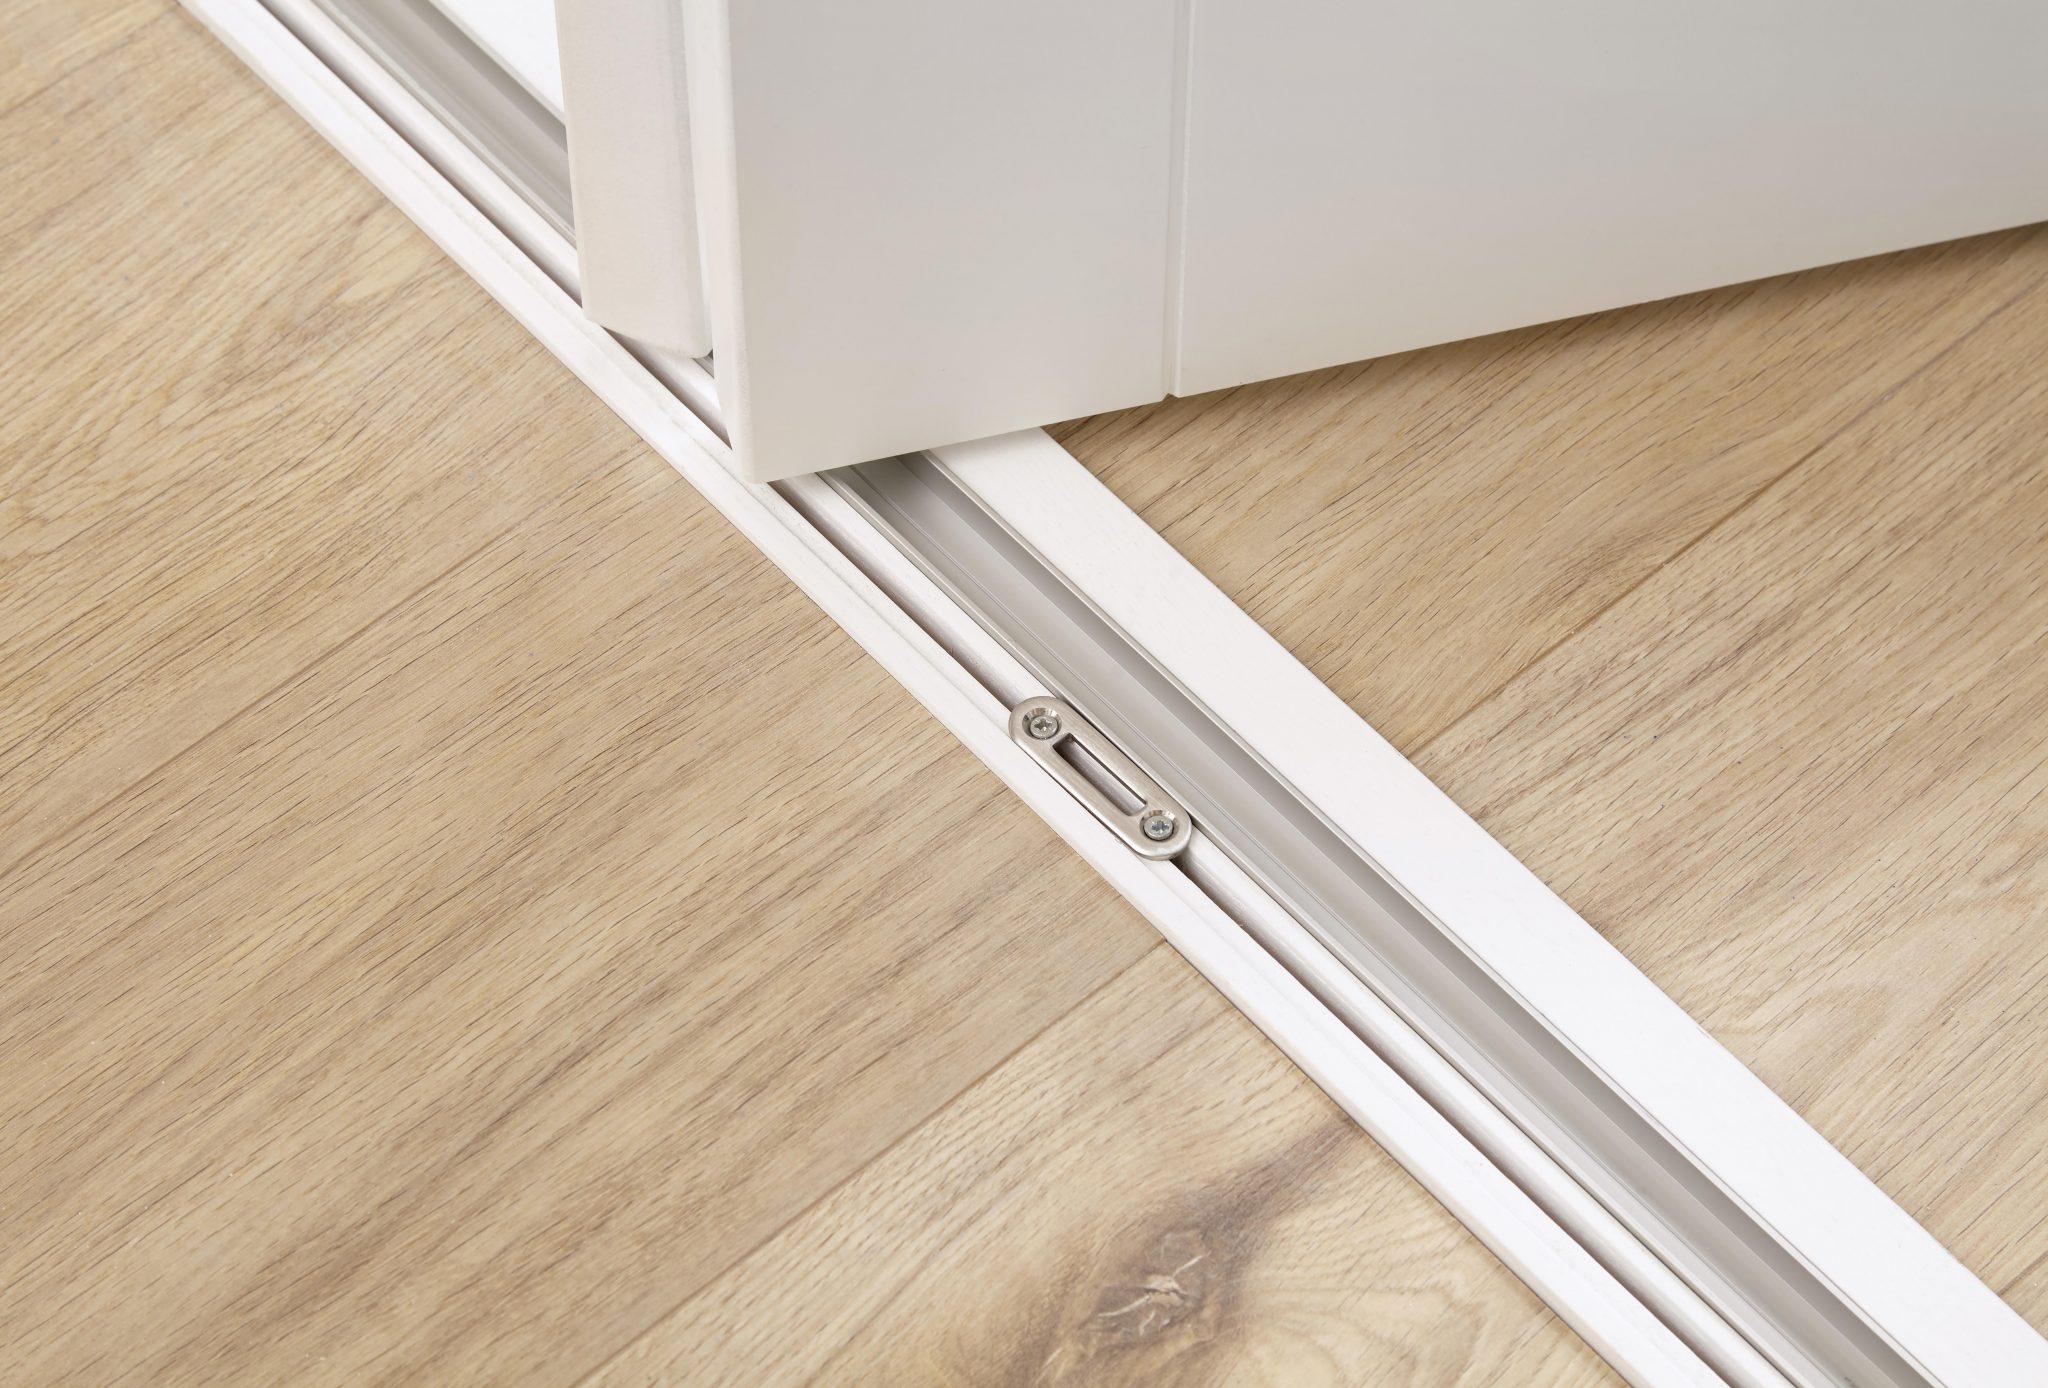 PREMIER White 4L Shaker Roomfold - Clear